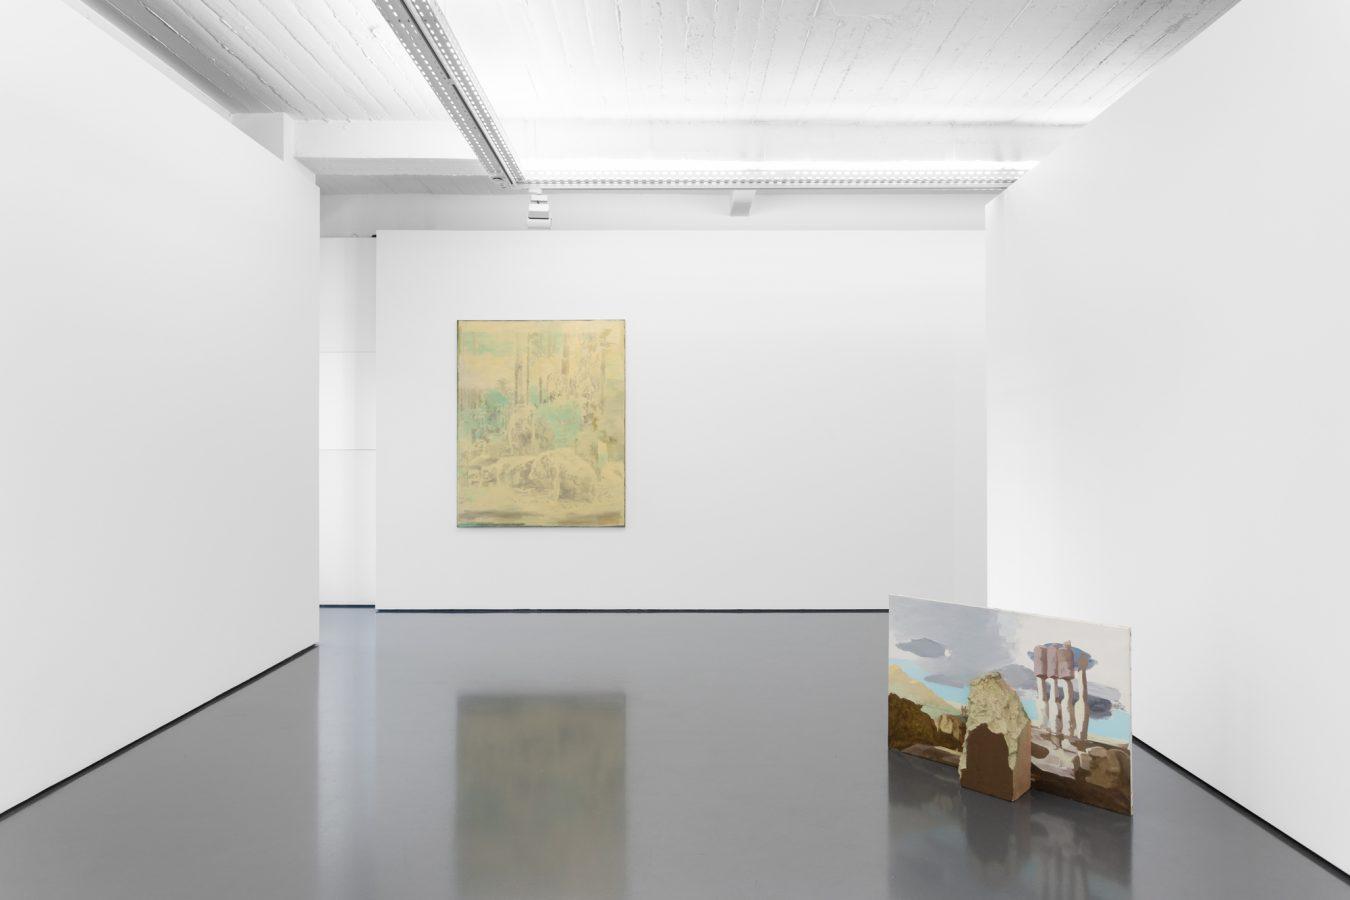 Galeria Pedro Cera – Ana Jotta, Daniel Gustav Cramer, Gil Heitor Cortesão, Luís Paulo Costa and Paulo Brighenti - Where and When